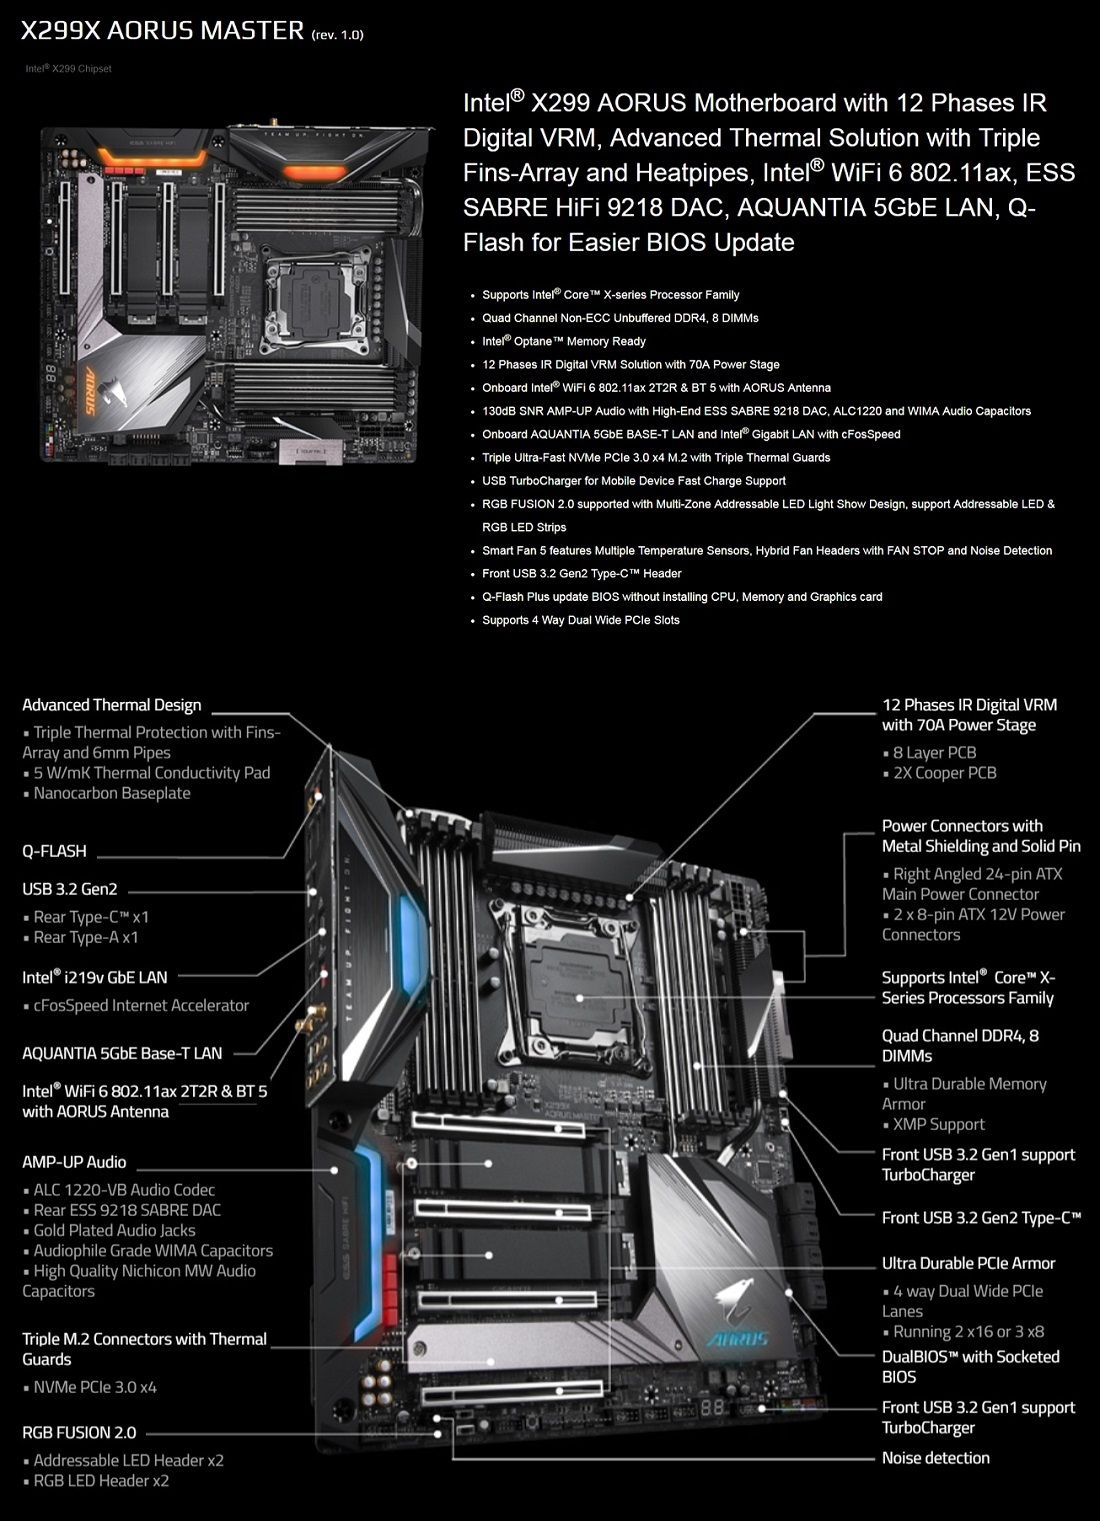 Gigabyte X299X Aorus Master ATX MB S2066 M2 RAID 5GbE WiFi6 BT CrossFire SLI RGB